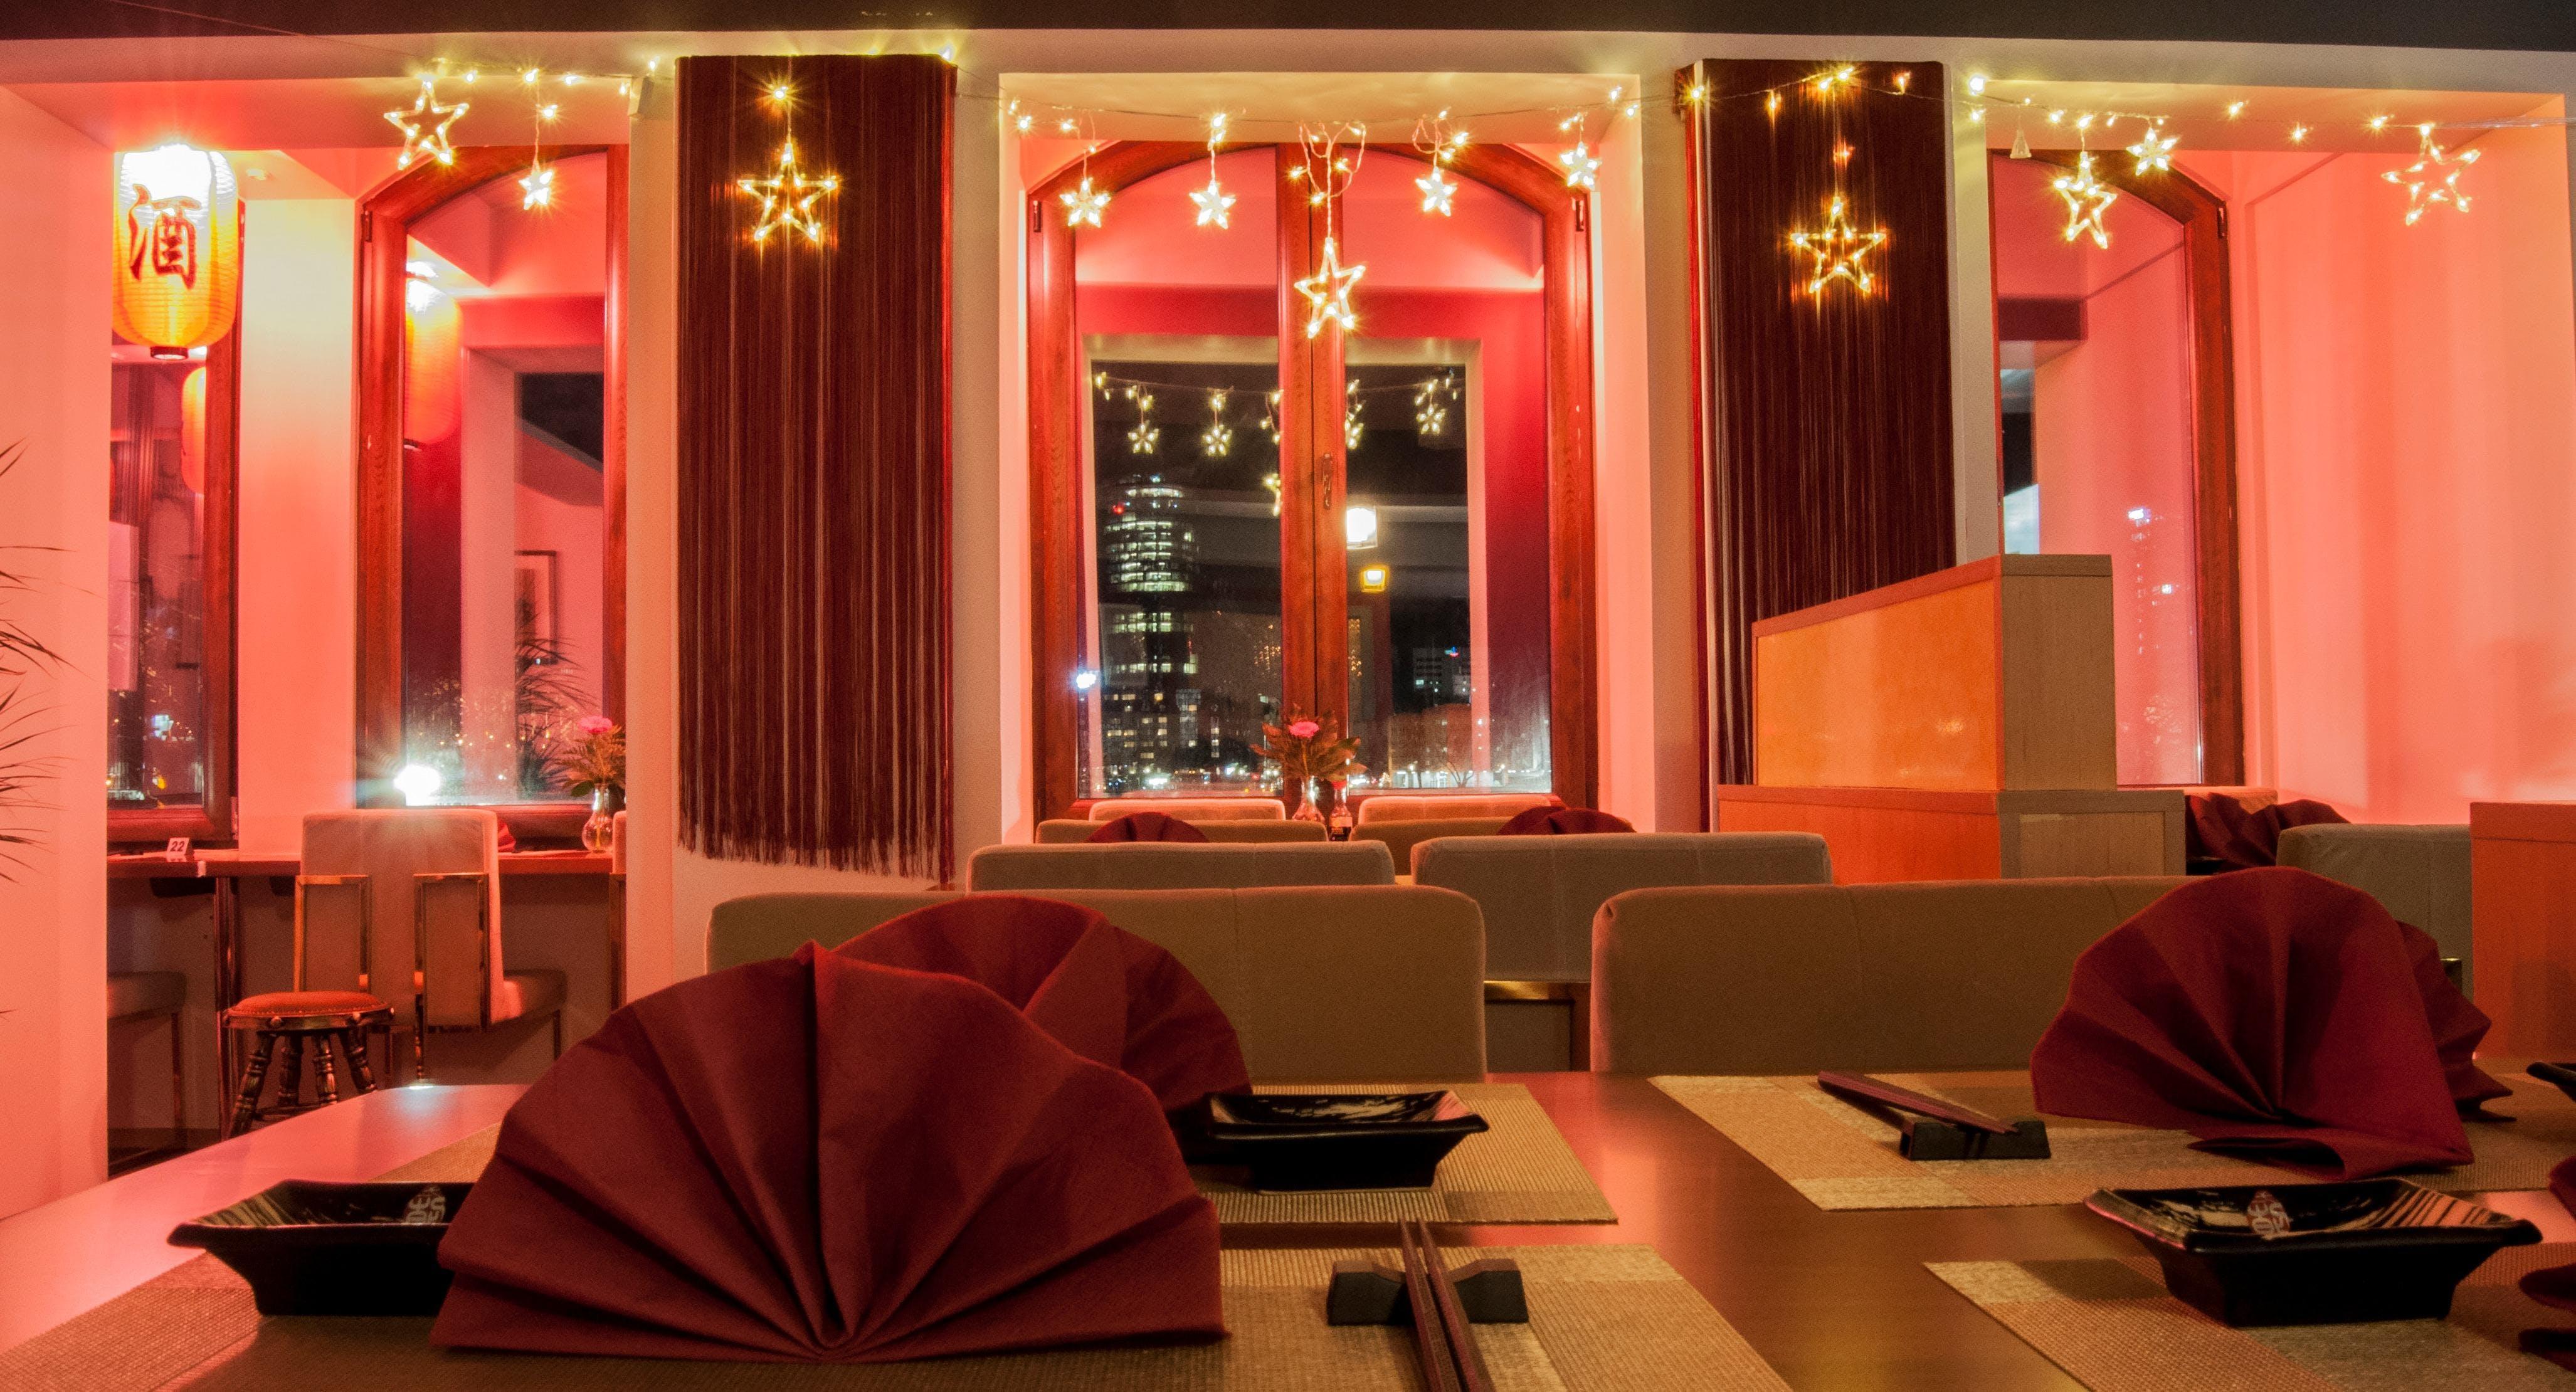 Chao | Asian Food & Sushi Köln image 1